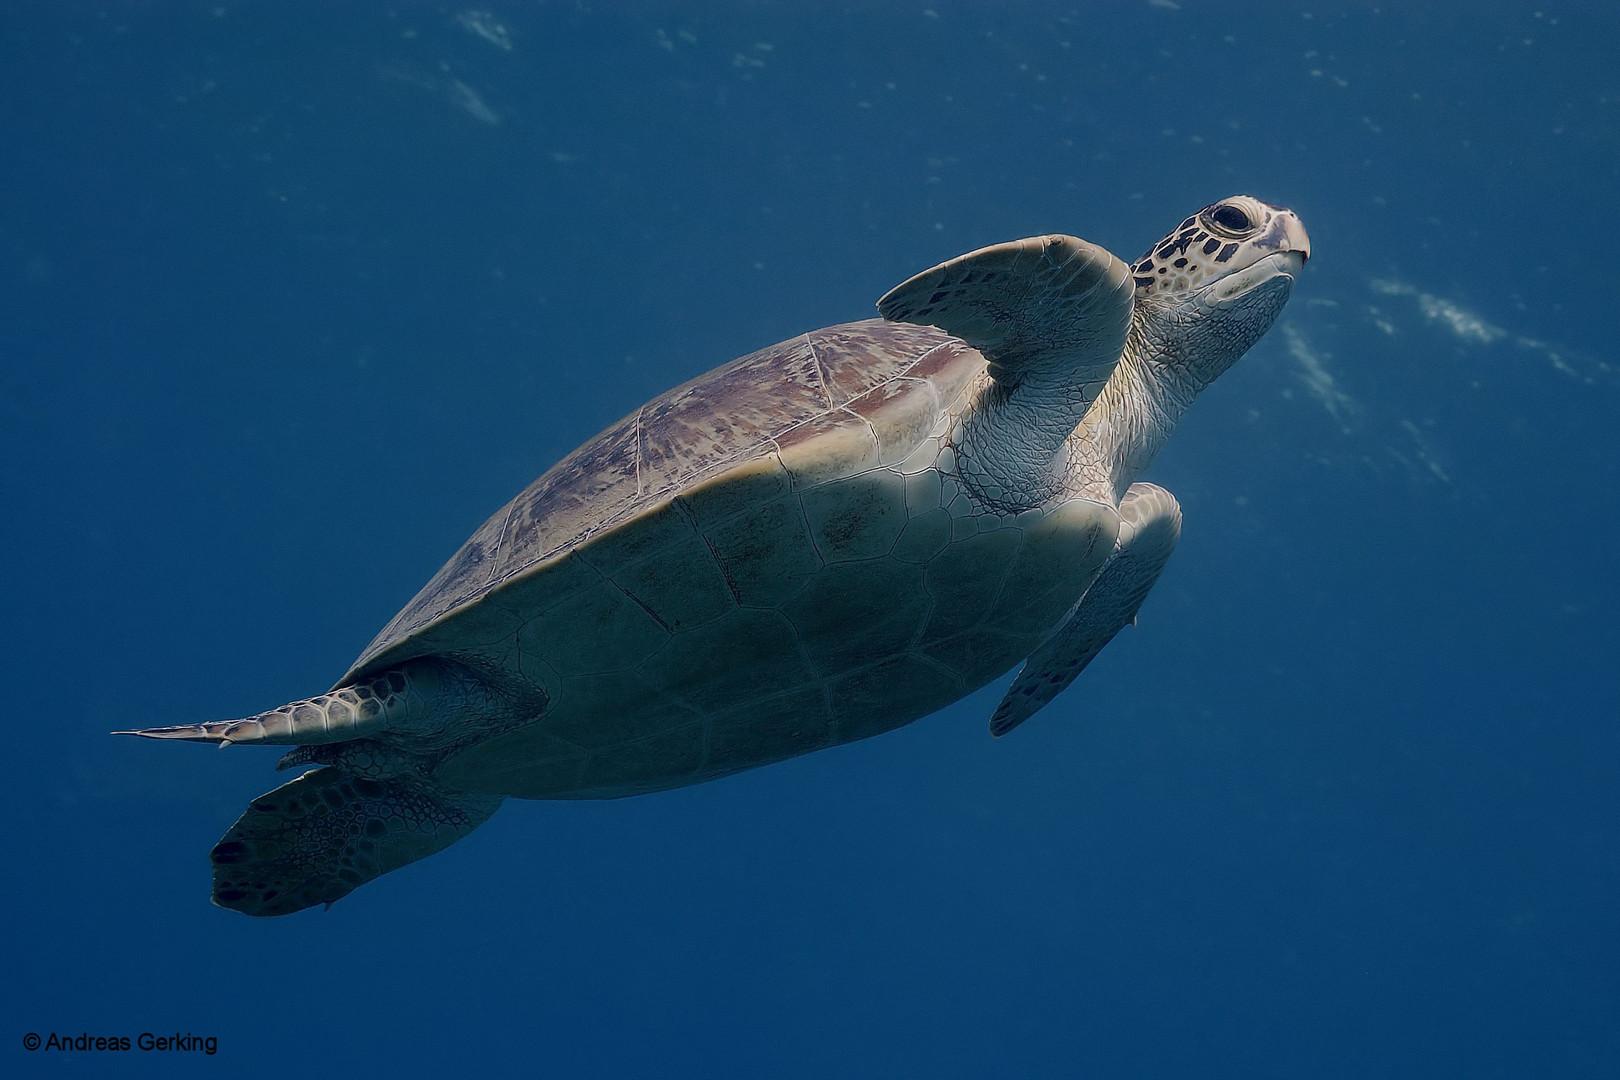 Unechte Karettschildkröte (Caretta caretta)